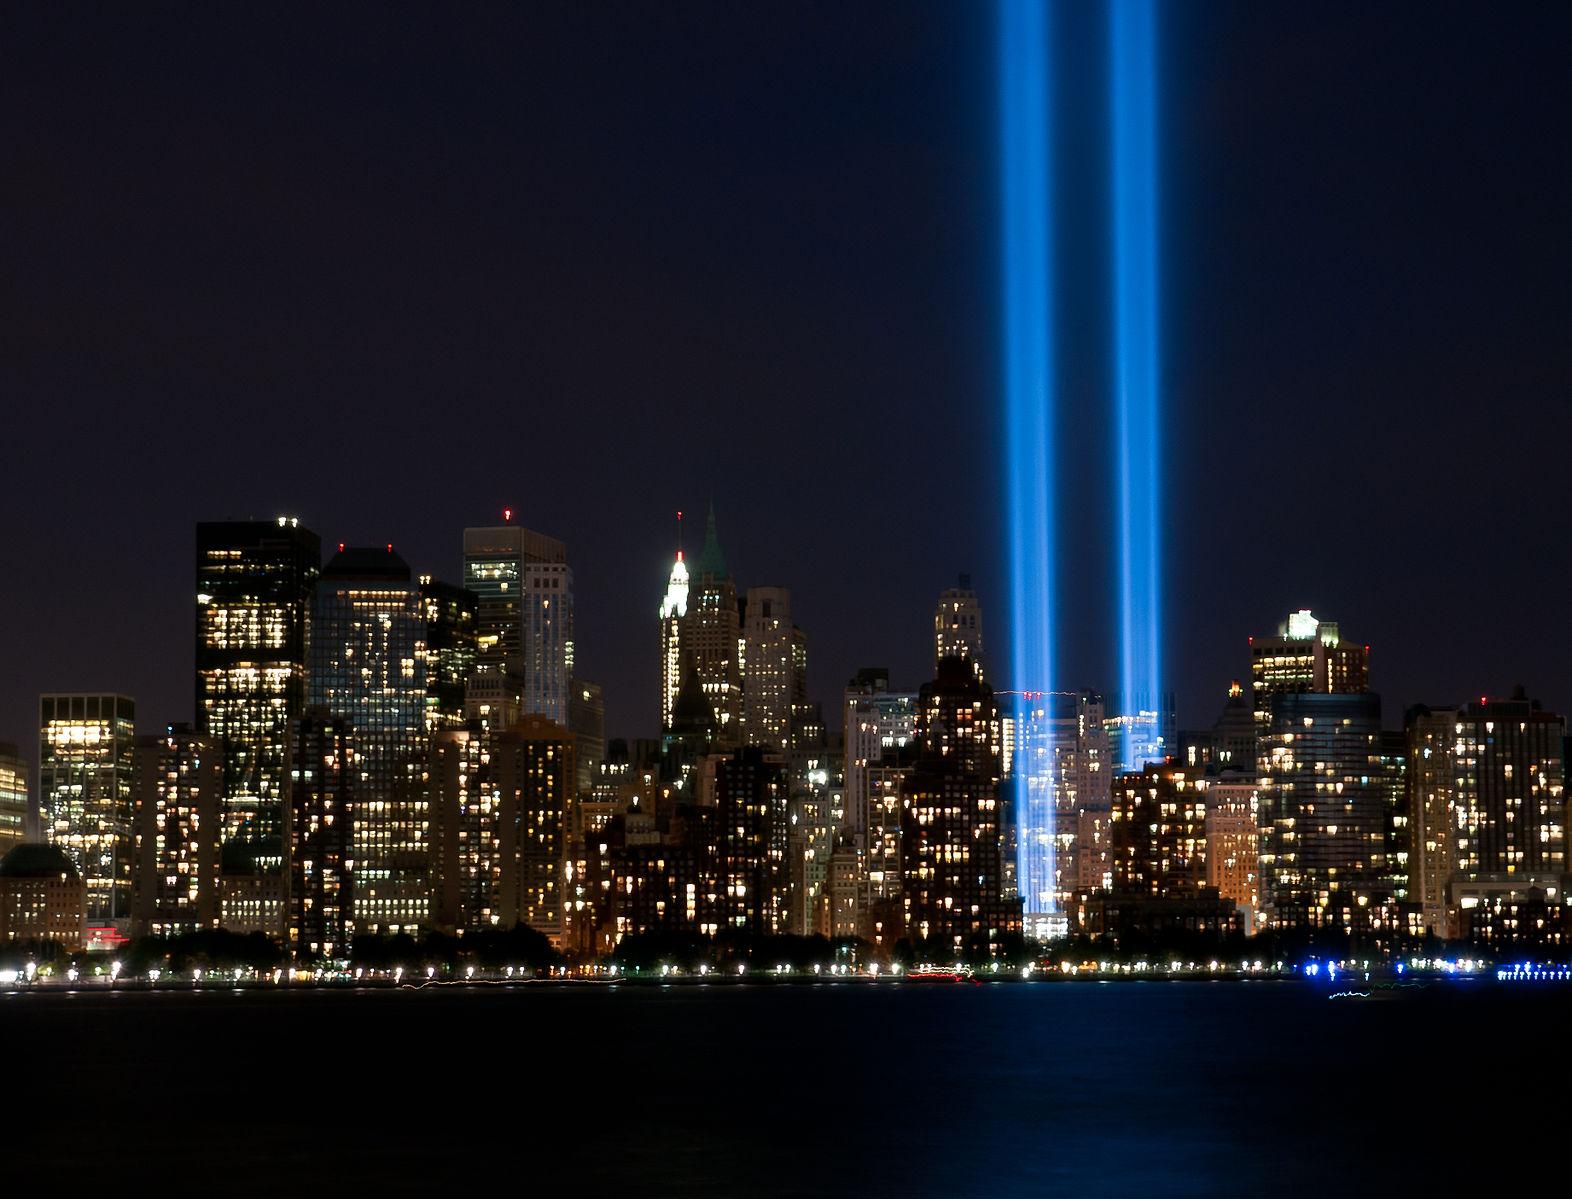 9/11 15th Anniversary: Americans Mark September 2001